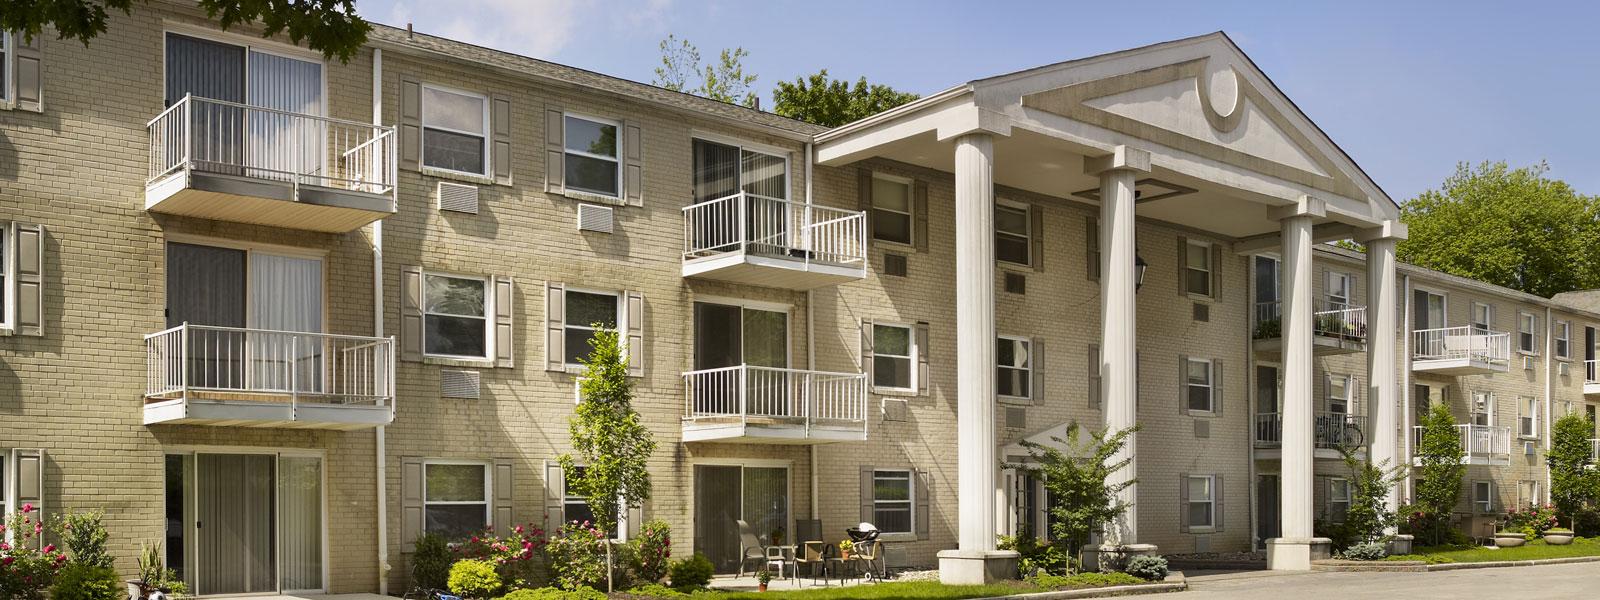 Green Hill Apartments Philadelphia Pa